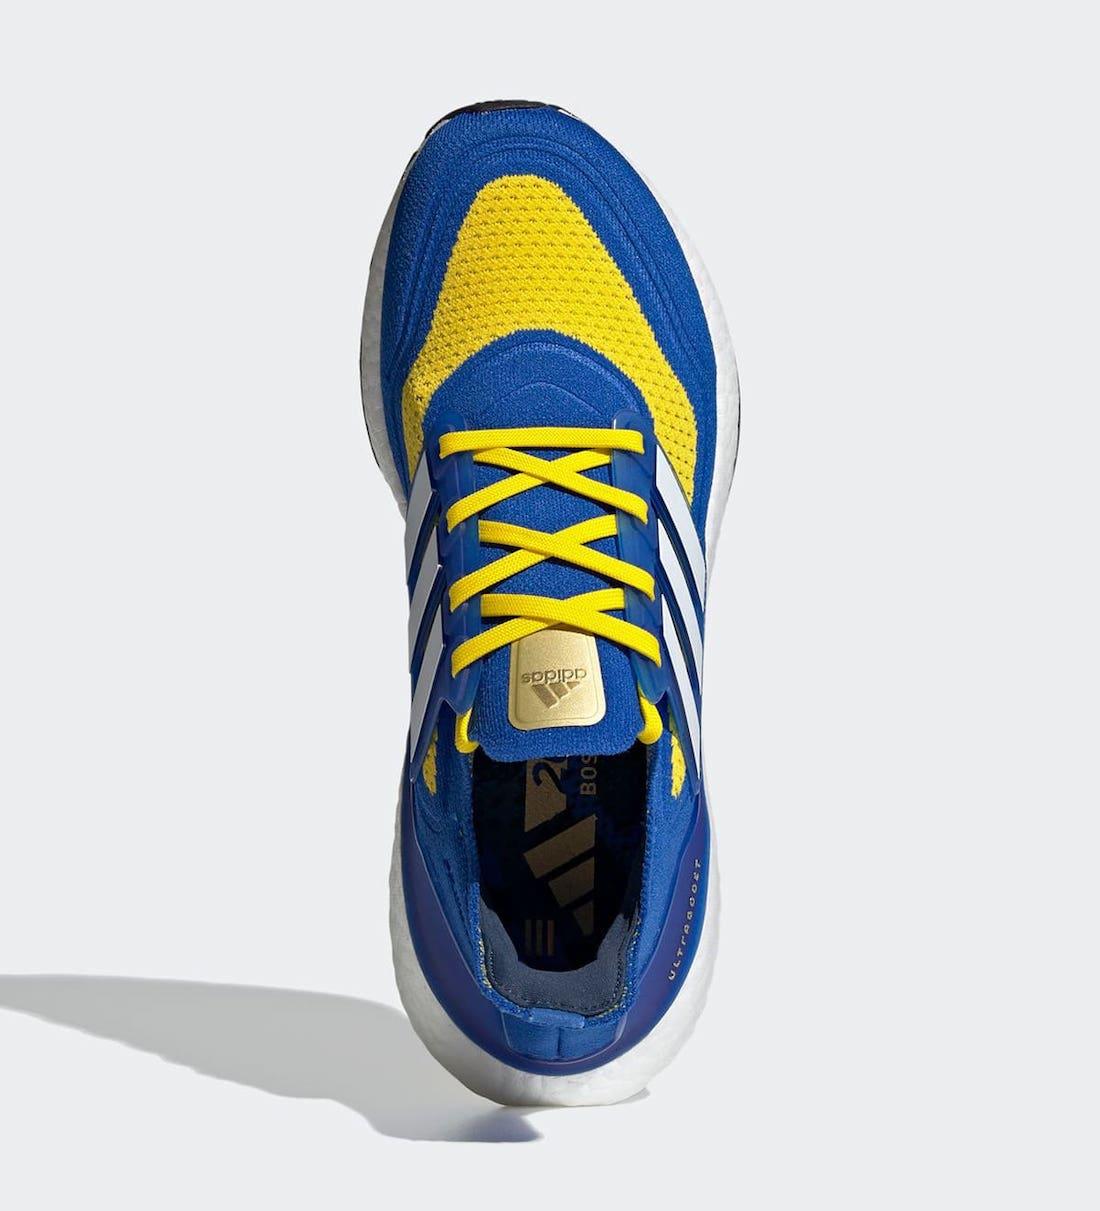 Ultra Boost DNA, Ultra Boost 20, Ultra Boost, Originals, LA Rams, Boost, adidas Ultra Boost 2021, adidas Originals, 2K Boost